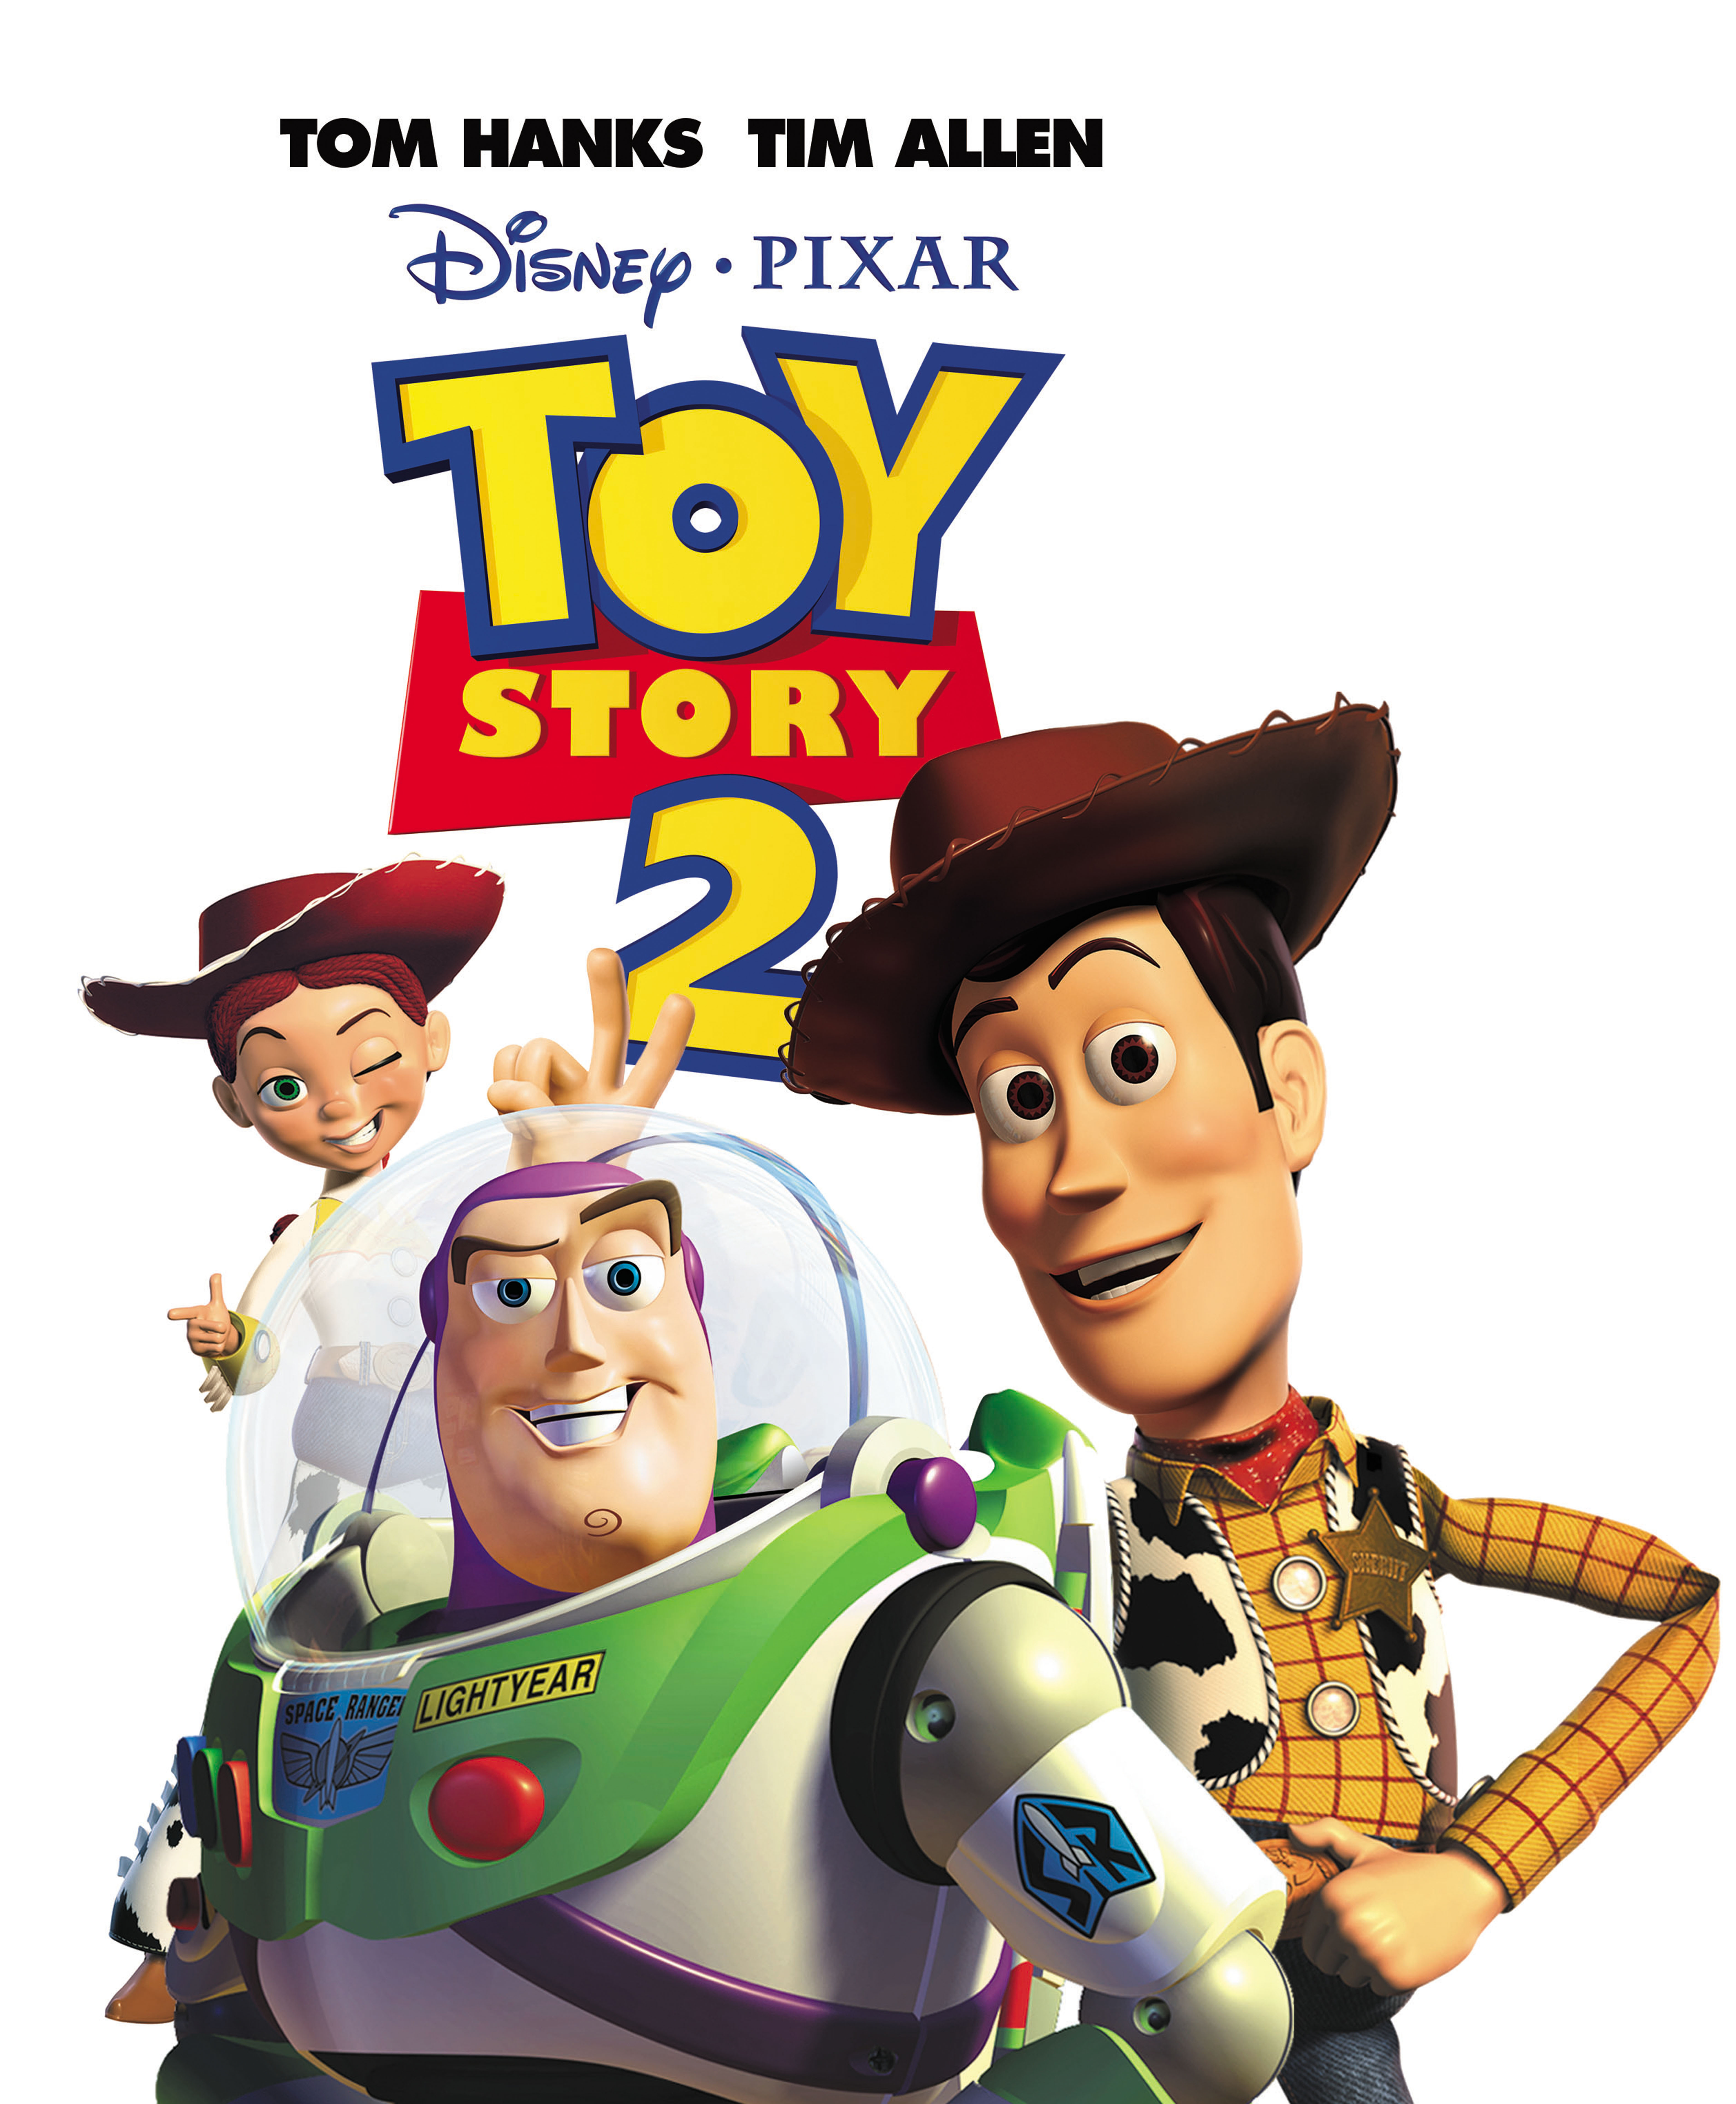 Toy Story 2 ทอย สเตอรี่ 2 HD 1999